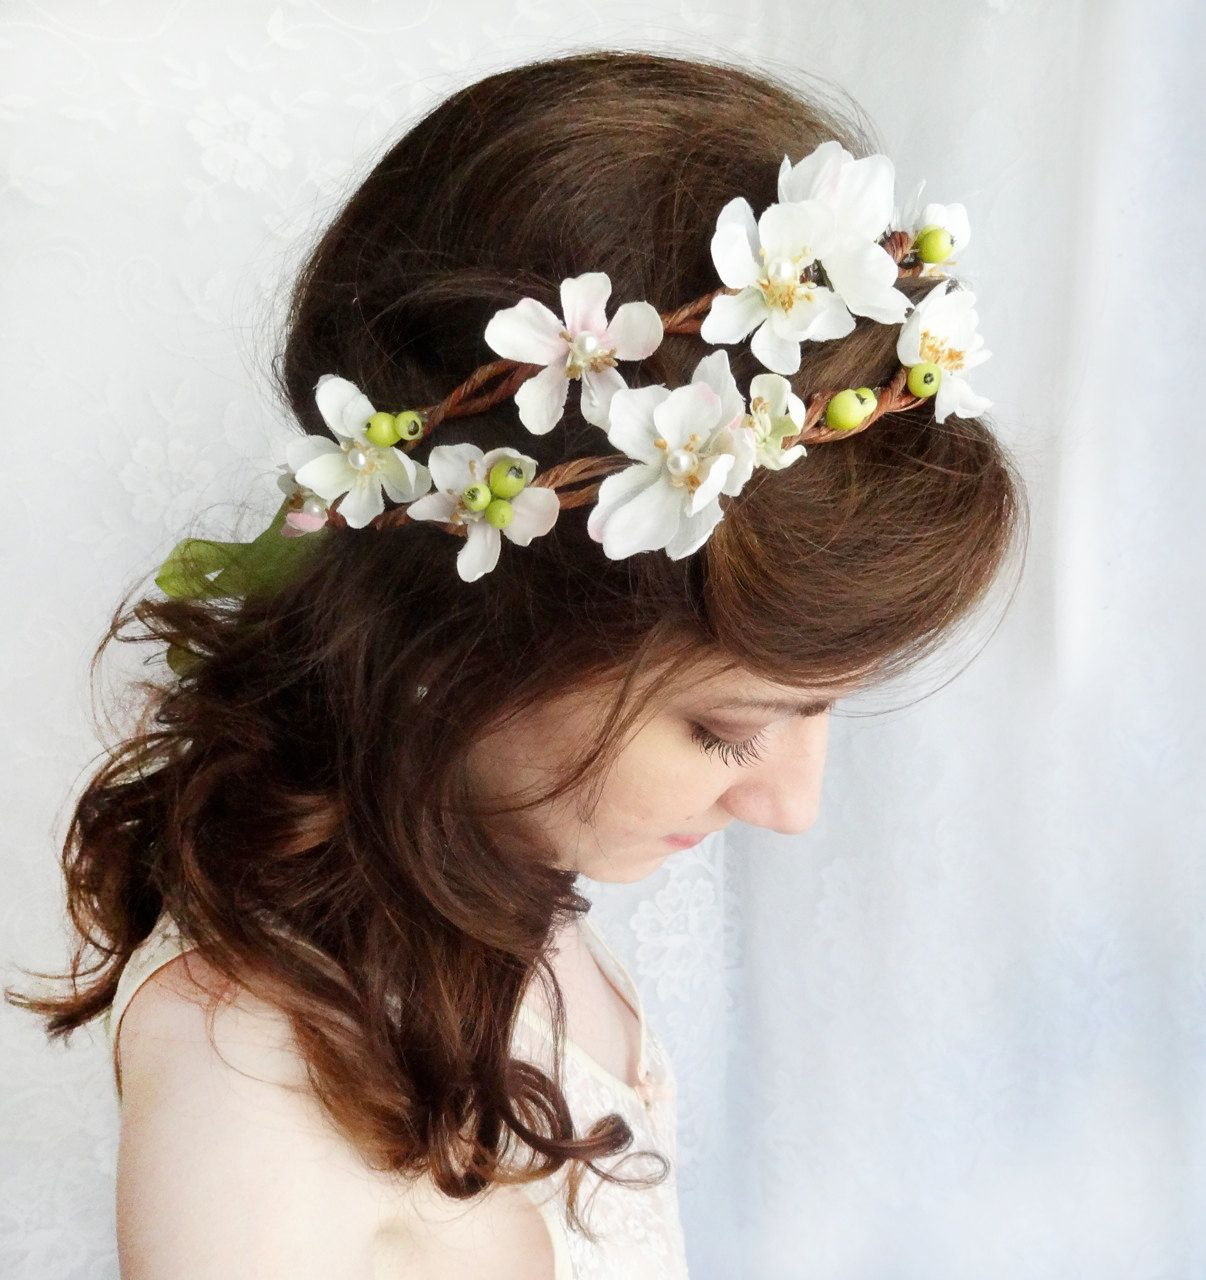 Floral Crown Rustic Wedding Headpiece White Bridal Hair